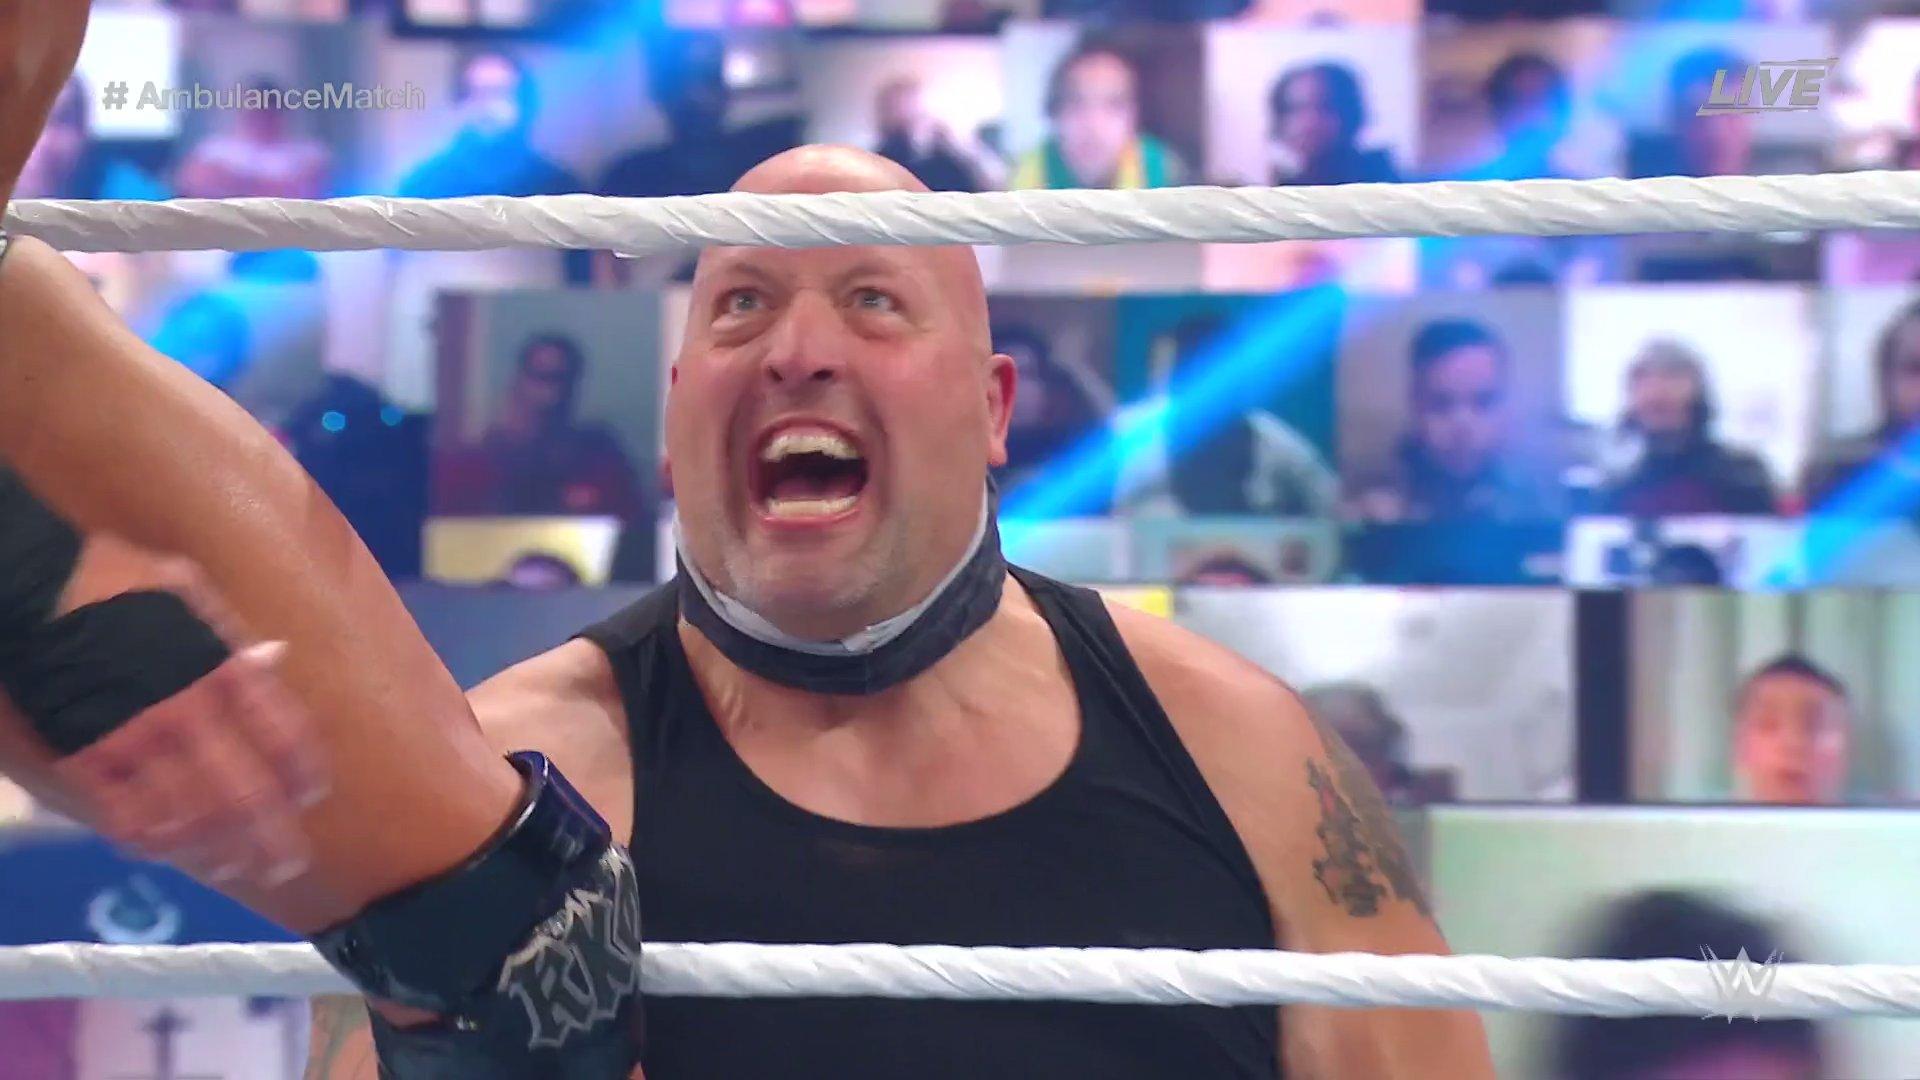 Lendas da WWE custam combate de Randy Orton no Clash of Champions